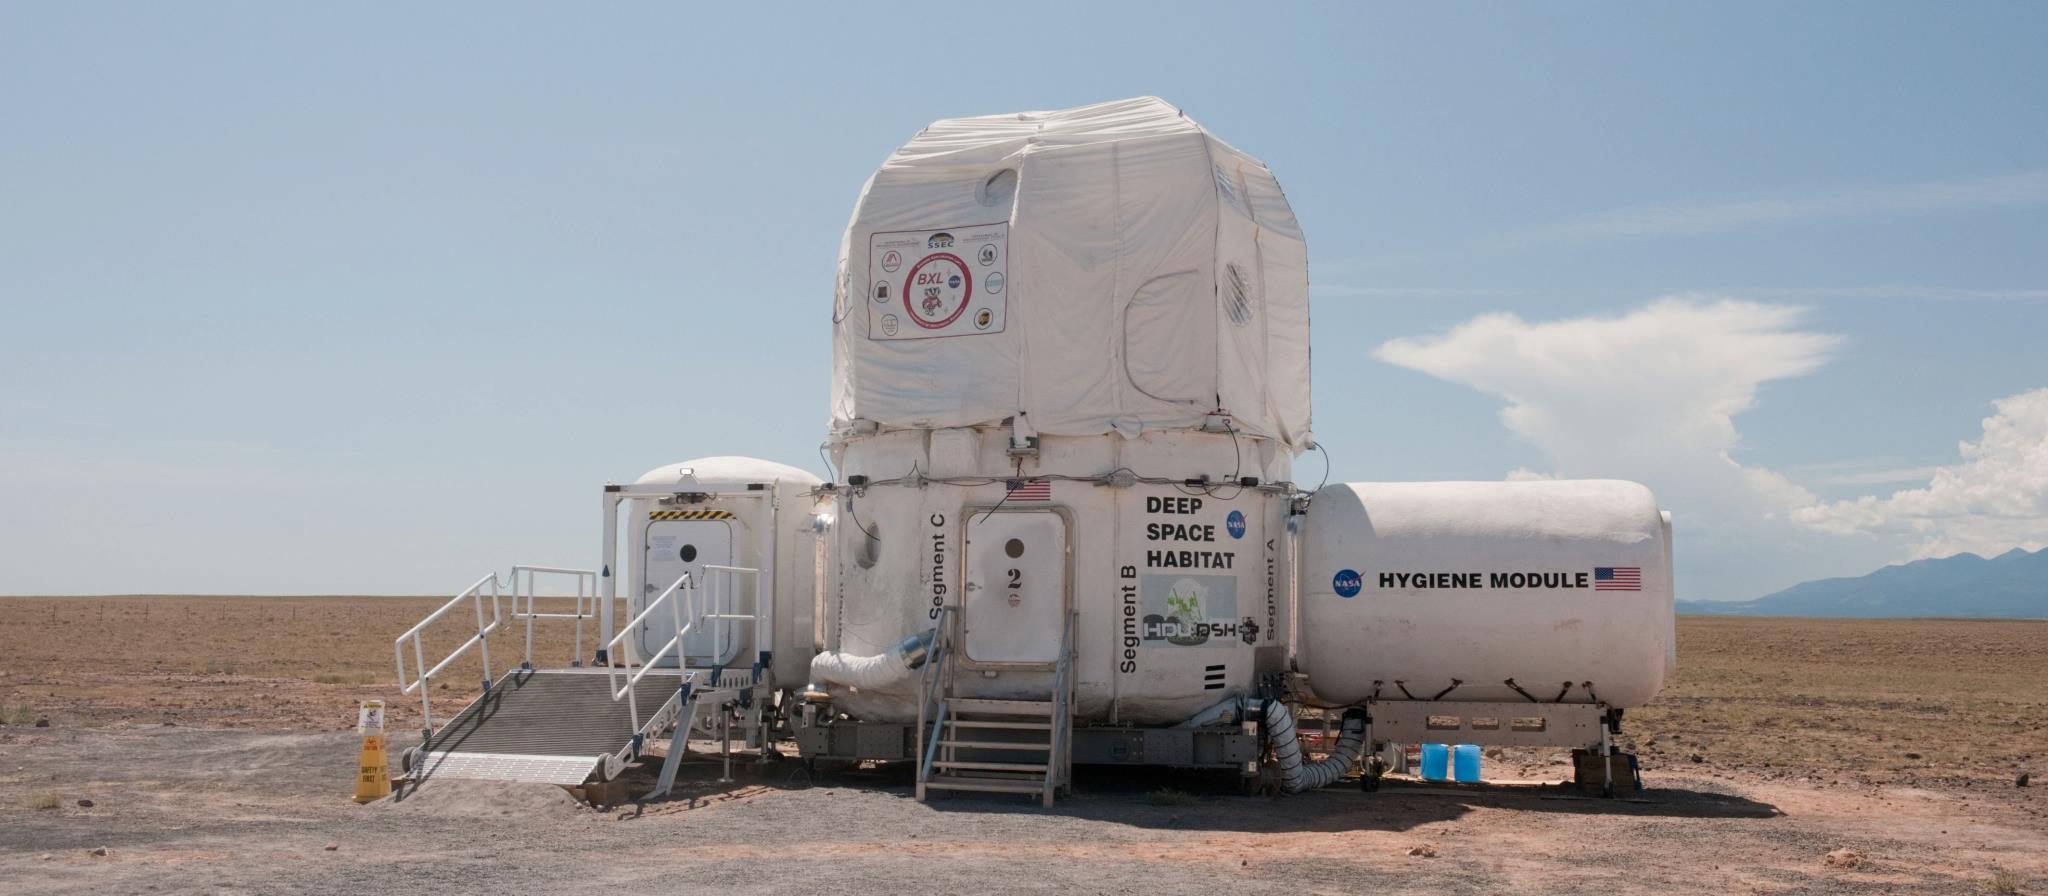 astronaut space habitat - photo #31